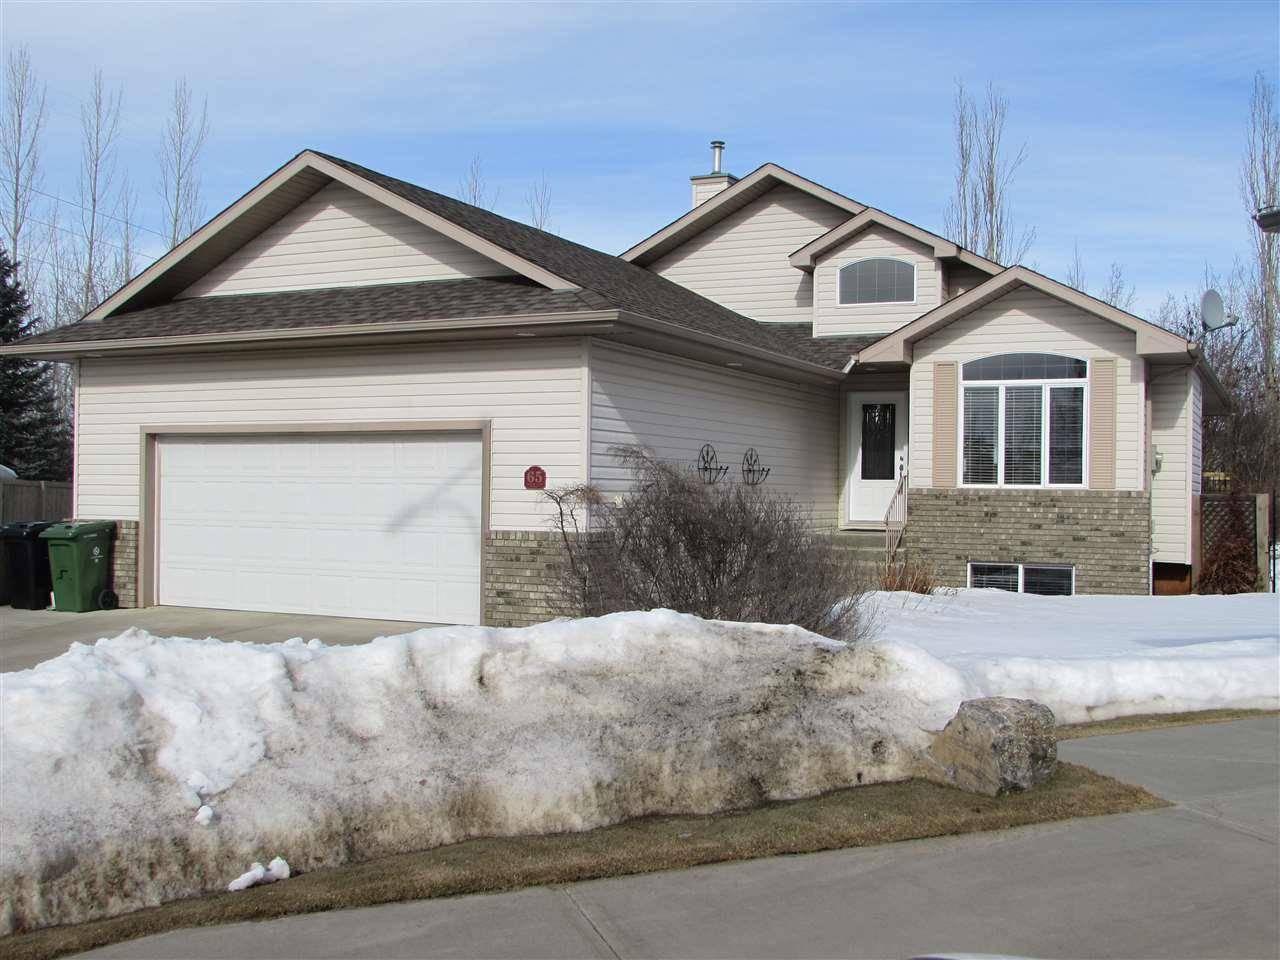 House for sale at 65 Valleyview Rg Fort Saskatchewan Alberta - MLS: E4189744